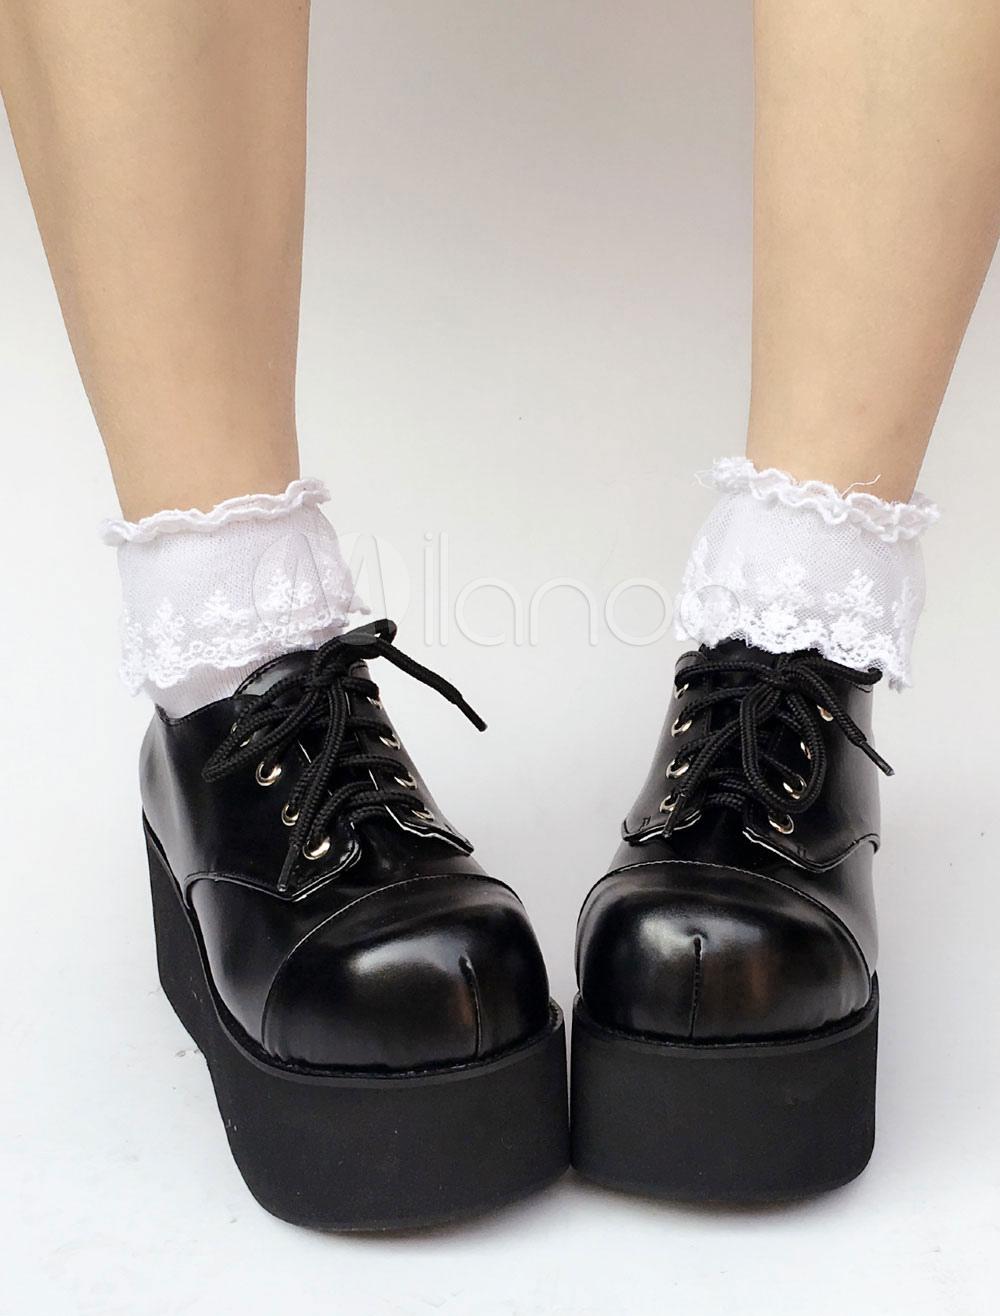 Sweet Lolita Shoes Black Platform Lace Up Round Toe Lolita Boots